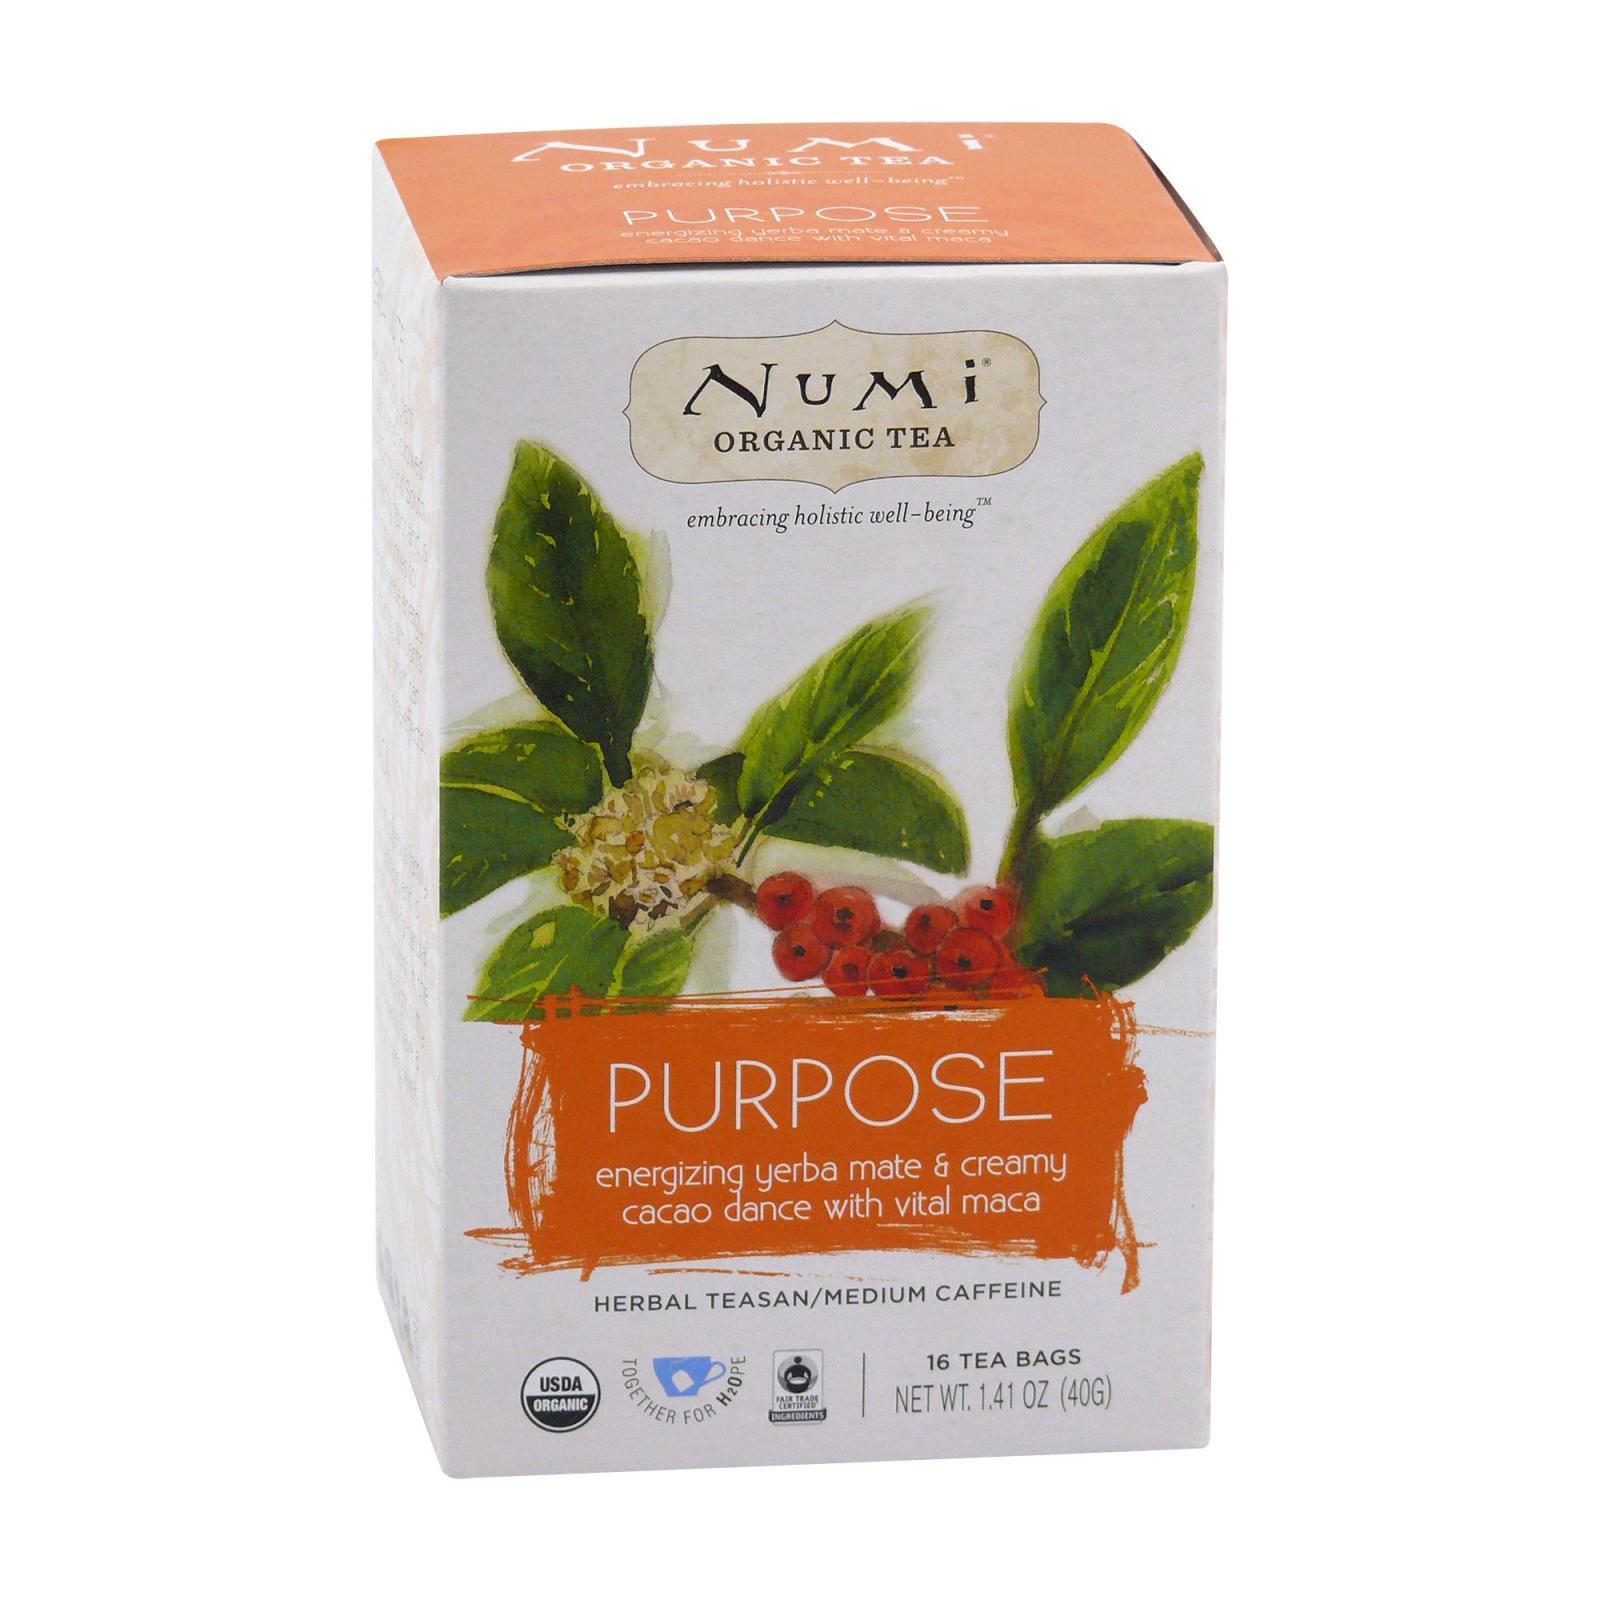 Numi Organic Tea Bylinný čaj Purpose 40 g, 16 ks